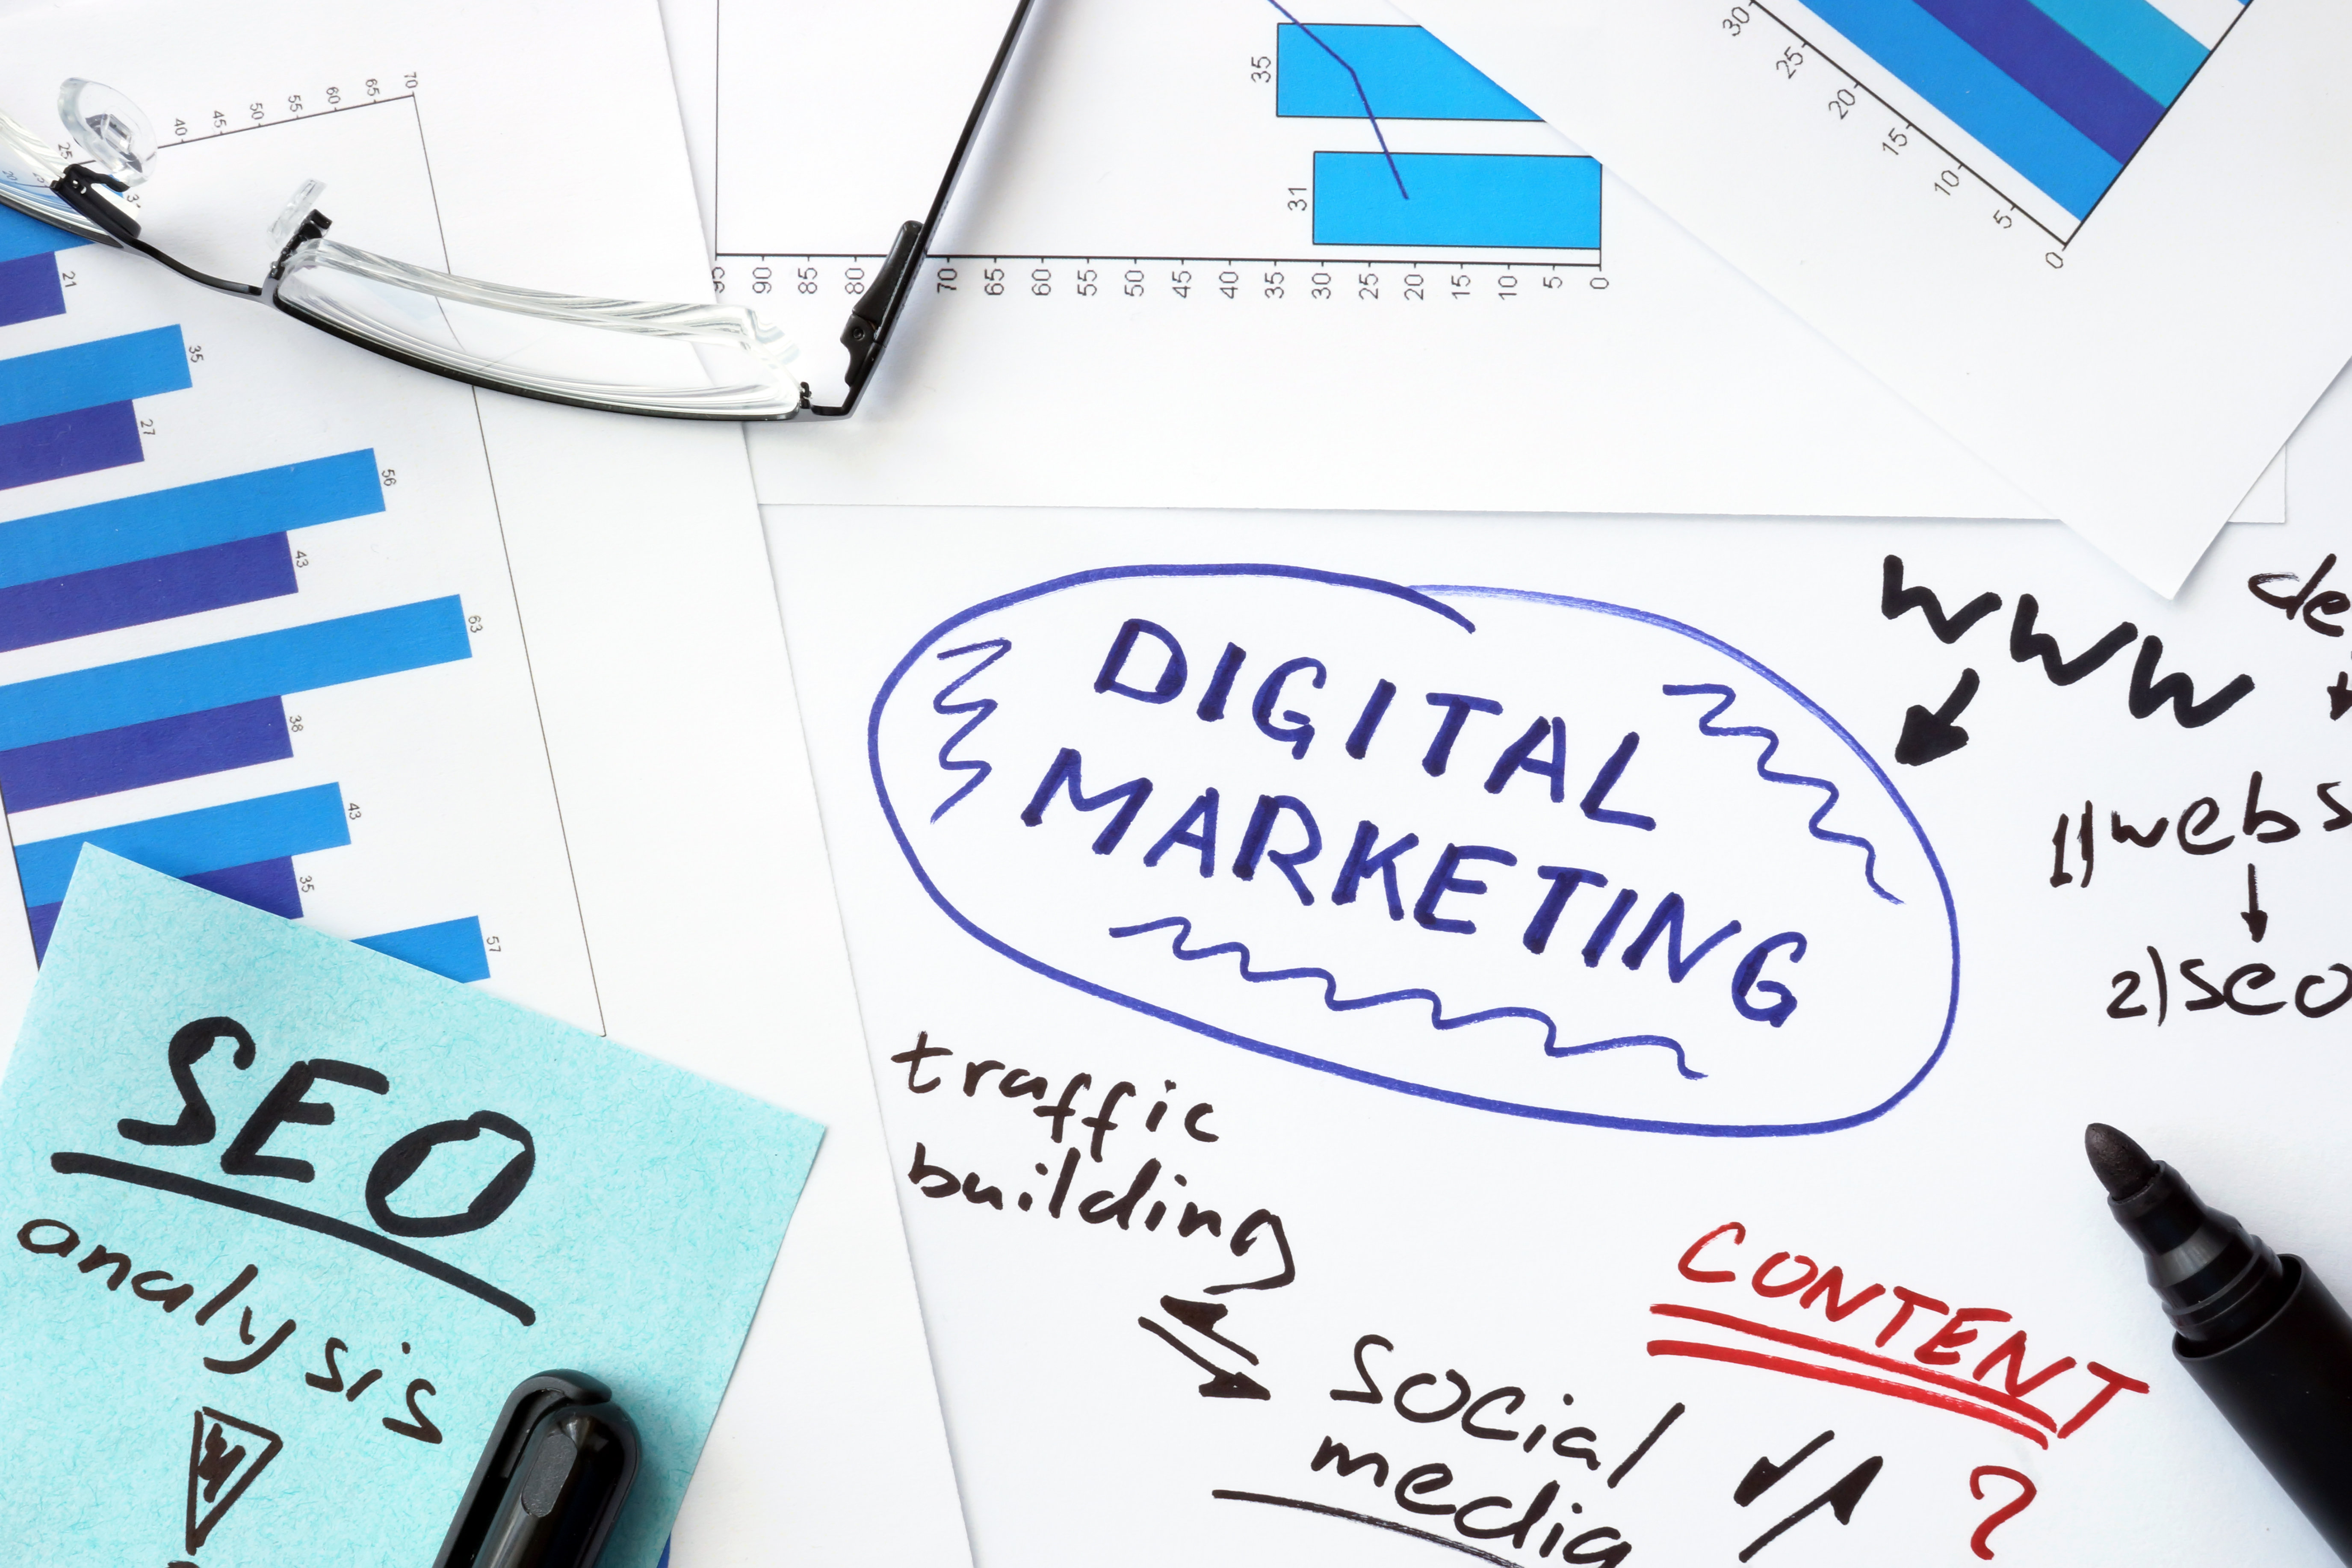 Digital Marketing Strategies Written On a Piece of Paper